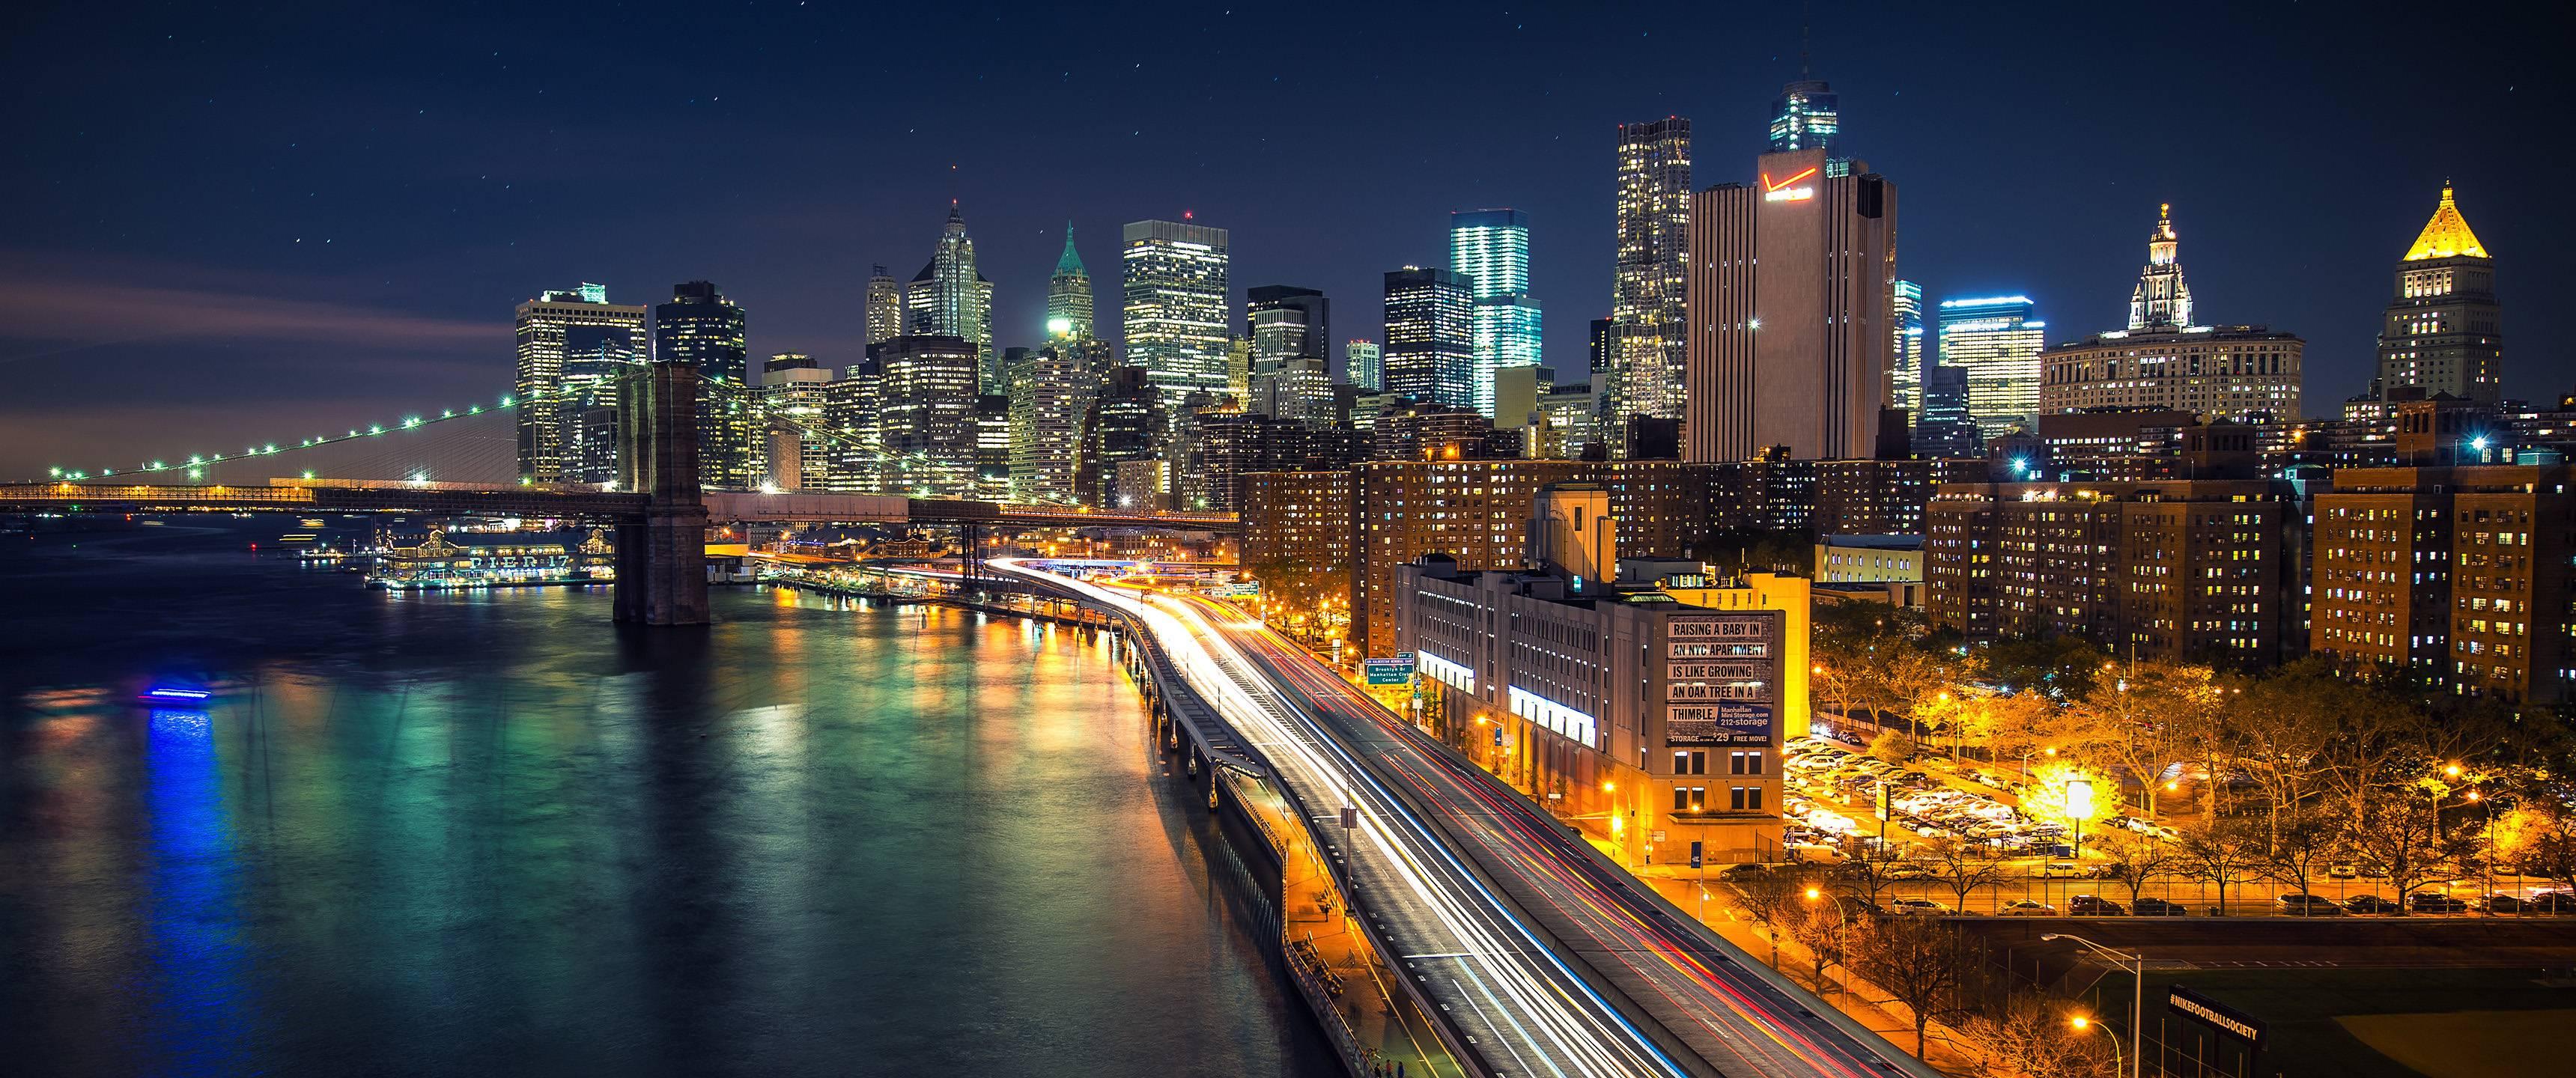 New York Ultra Wide - HD Wallpaper